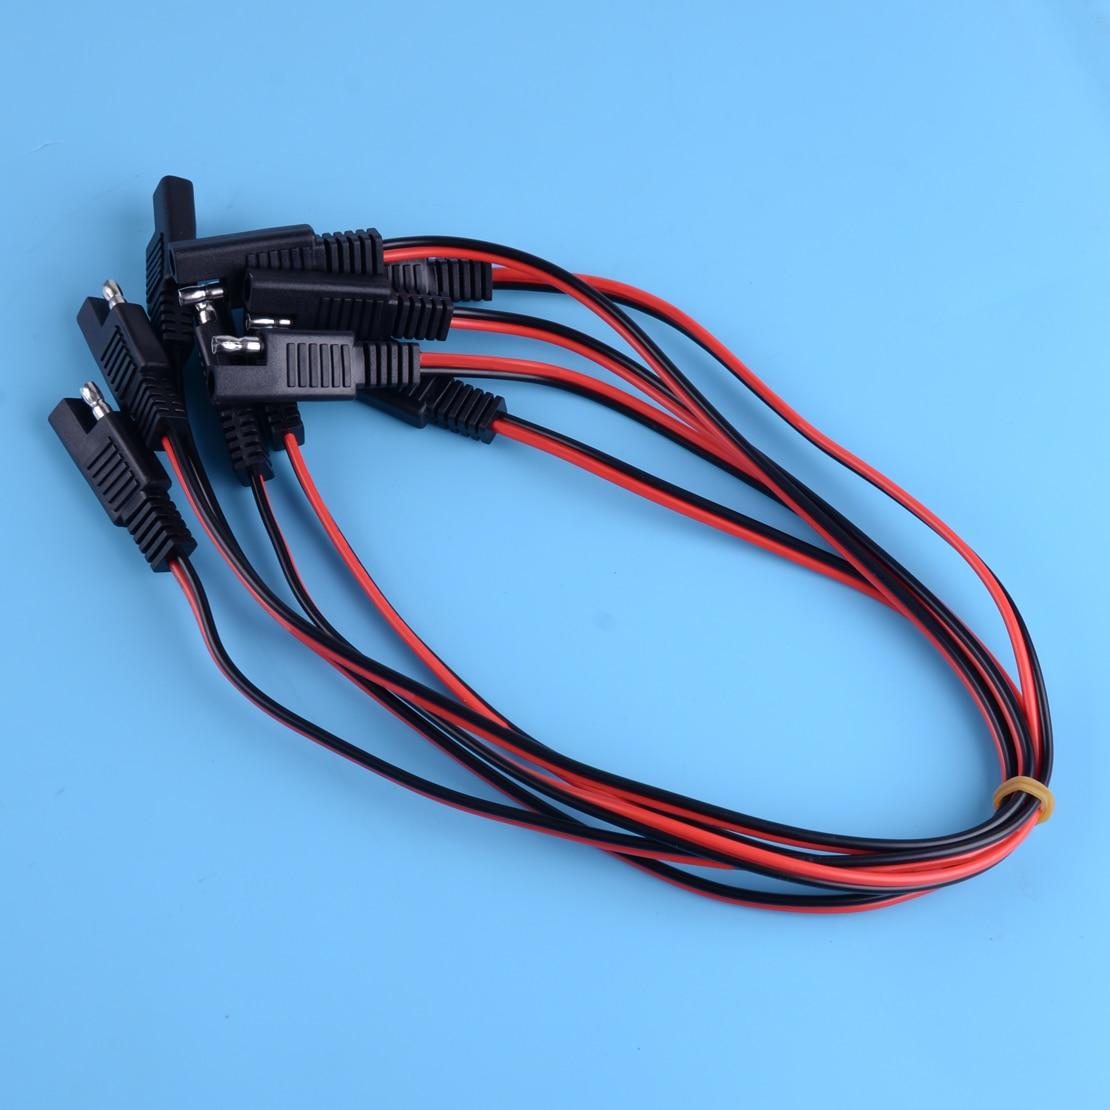 quick disconnect wiring harness beler 12v 120w 5 pcs 18 gauge flat 2 pin way quick disconnect wire  beler 12v 120w 5 pcs 18 gauge flat 2